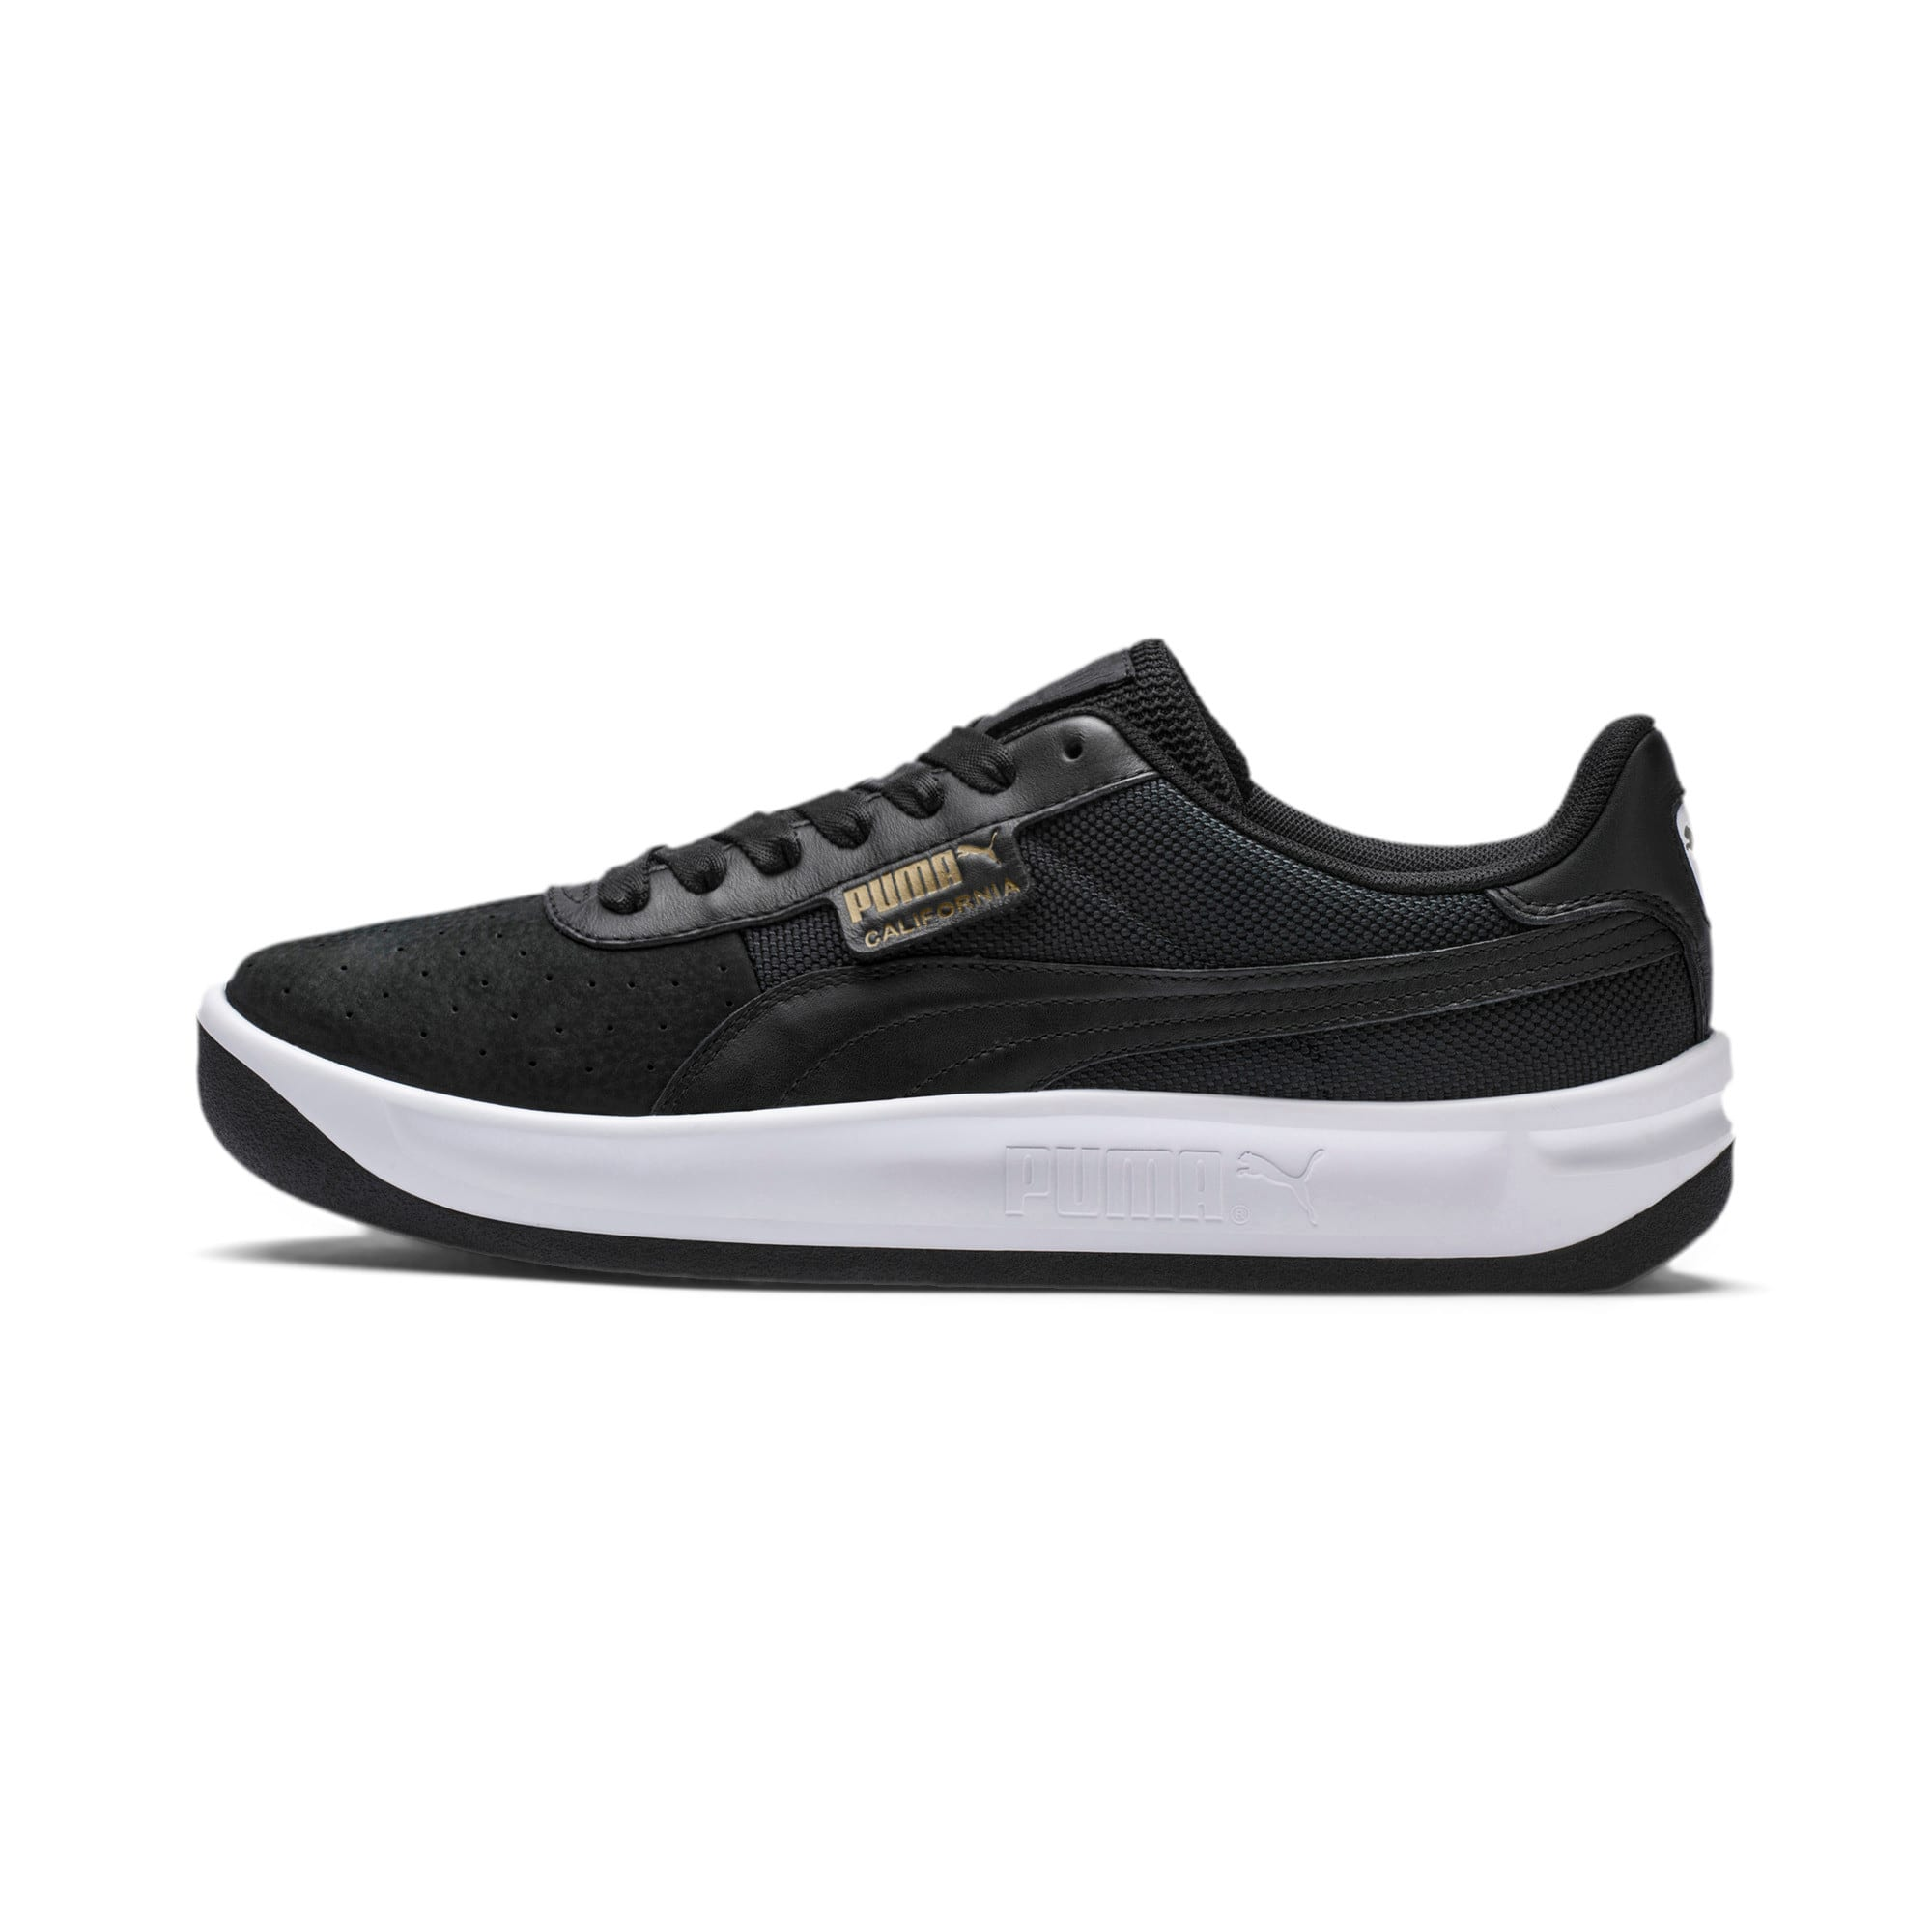 Miniatura 1 de Zapatos deportivos California, P Black-P White-P Black, mediano